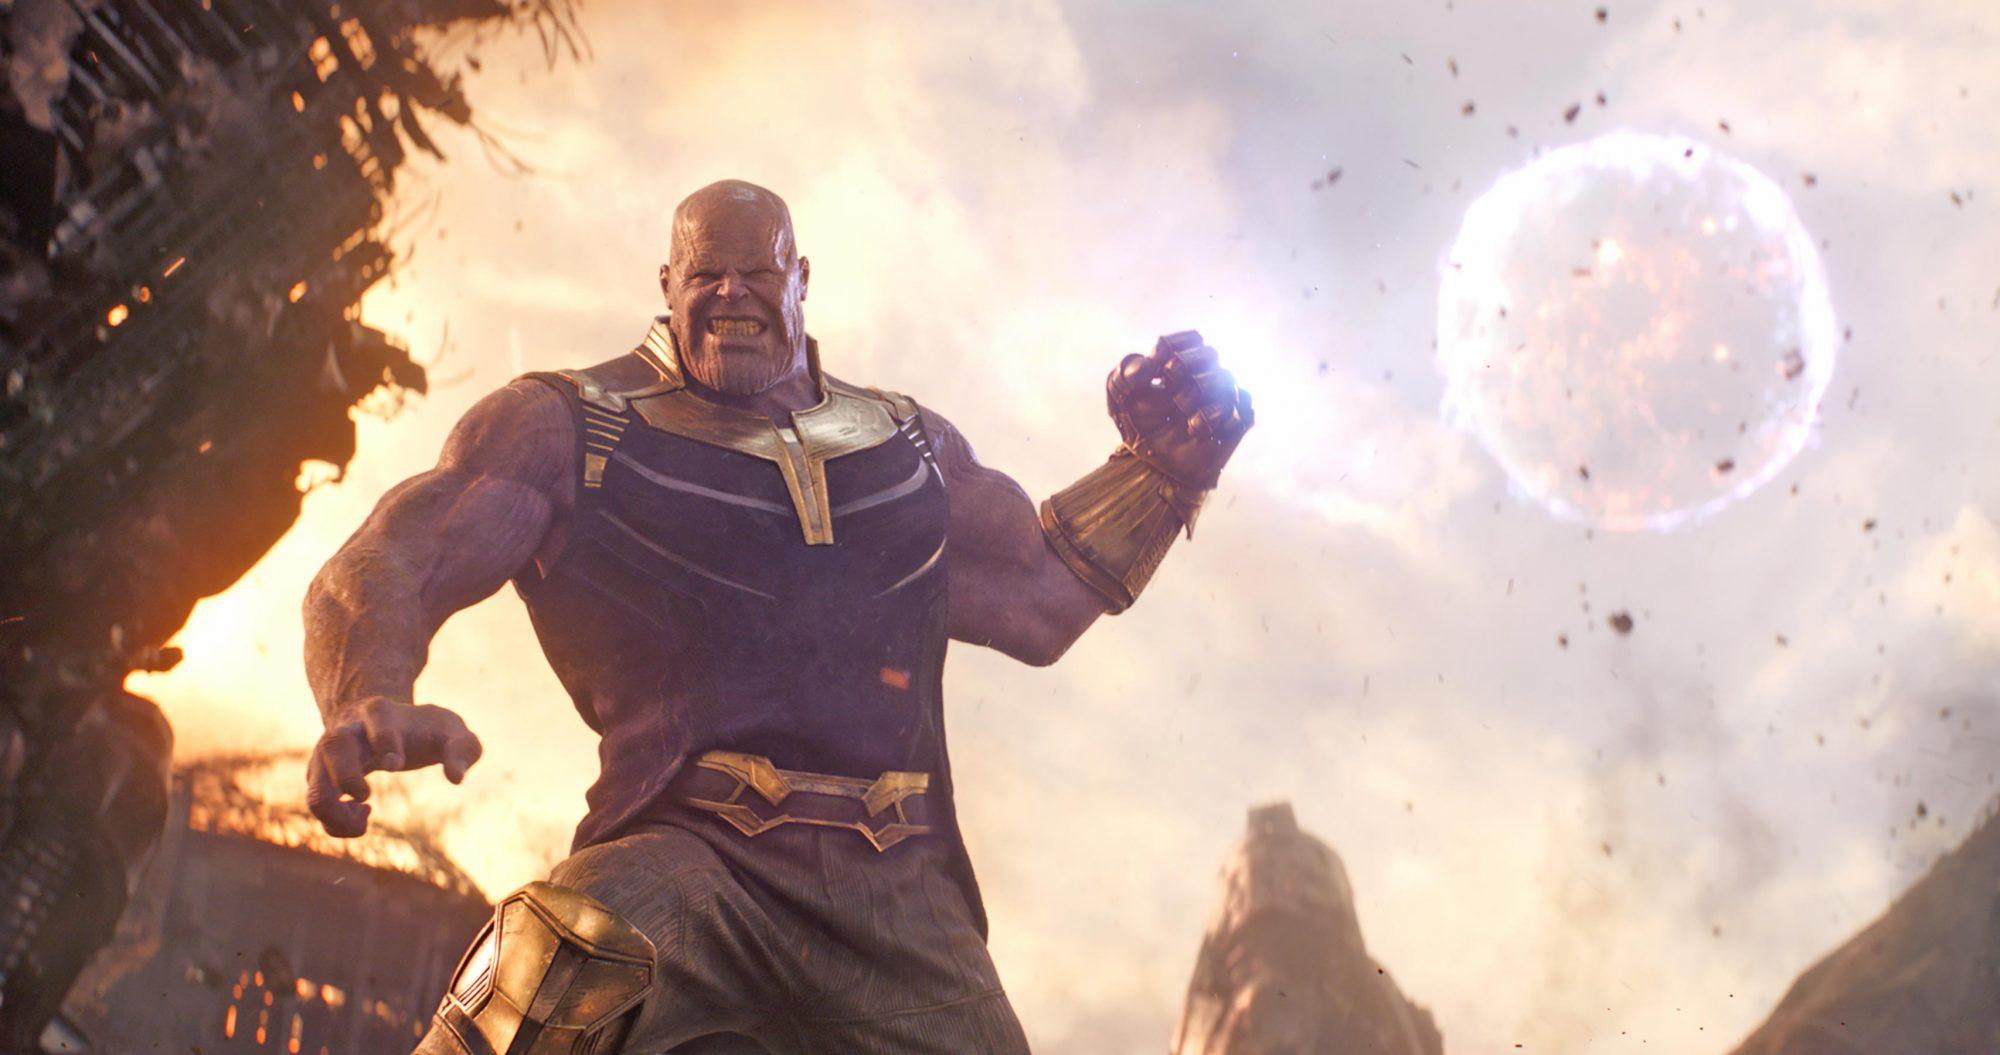 12. Avengers: Infinity War (2018)